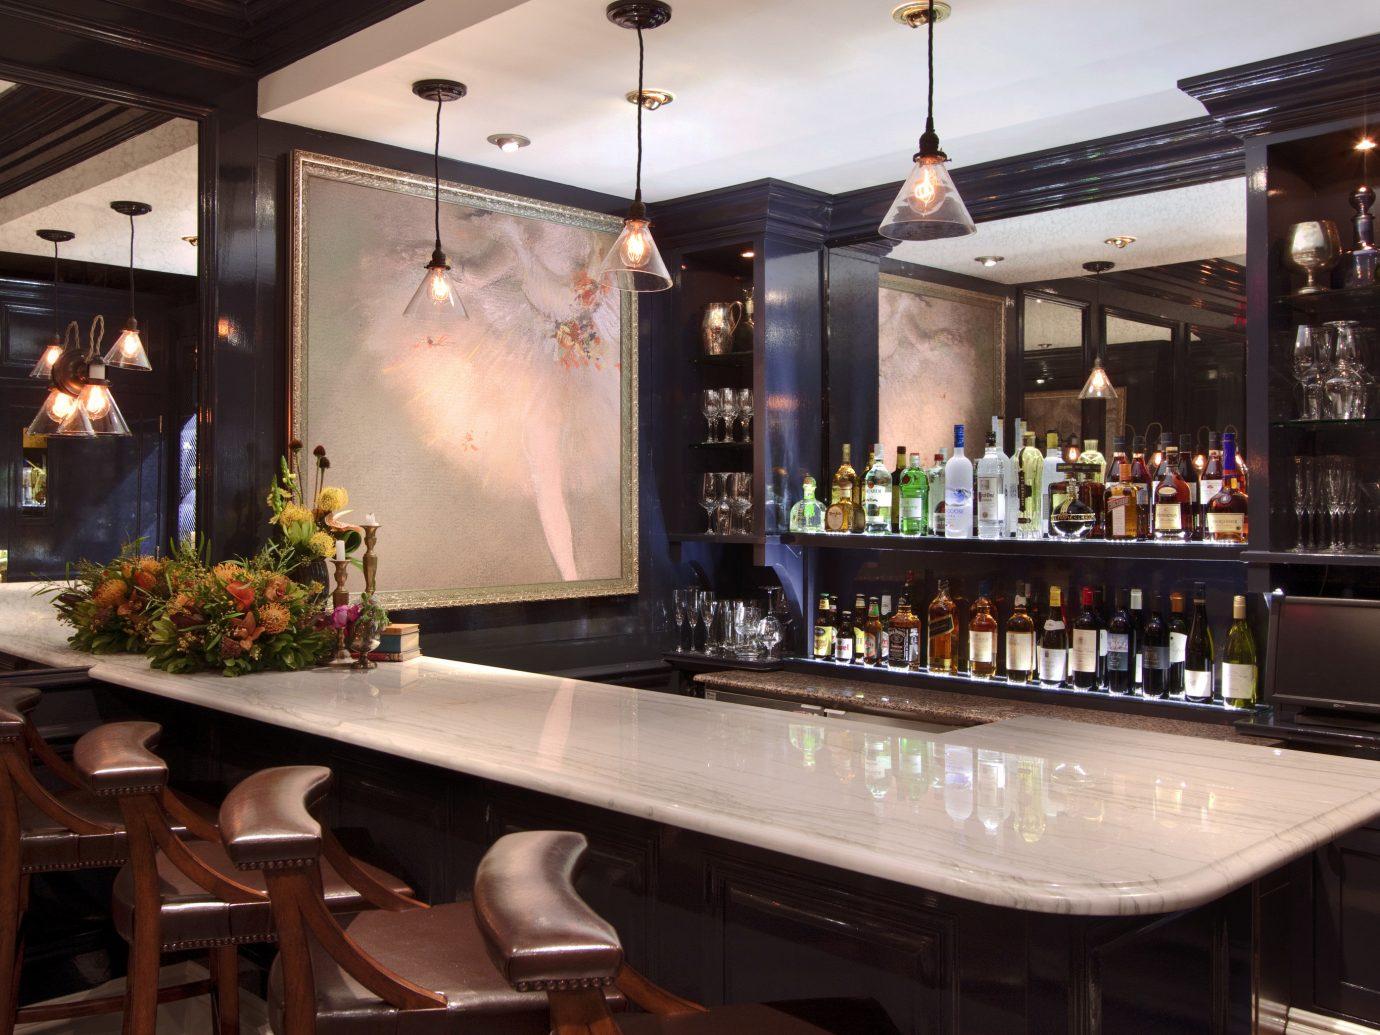 Food + Drink Romance indoor Bar restaurant counter interior design meal café estate table Island dining table